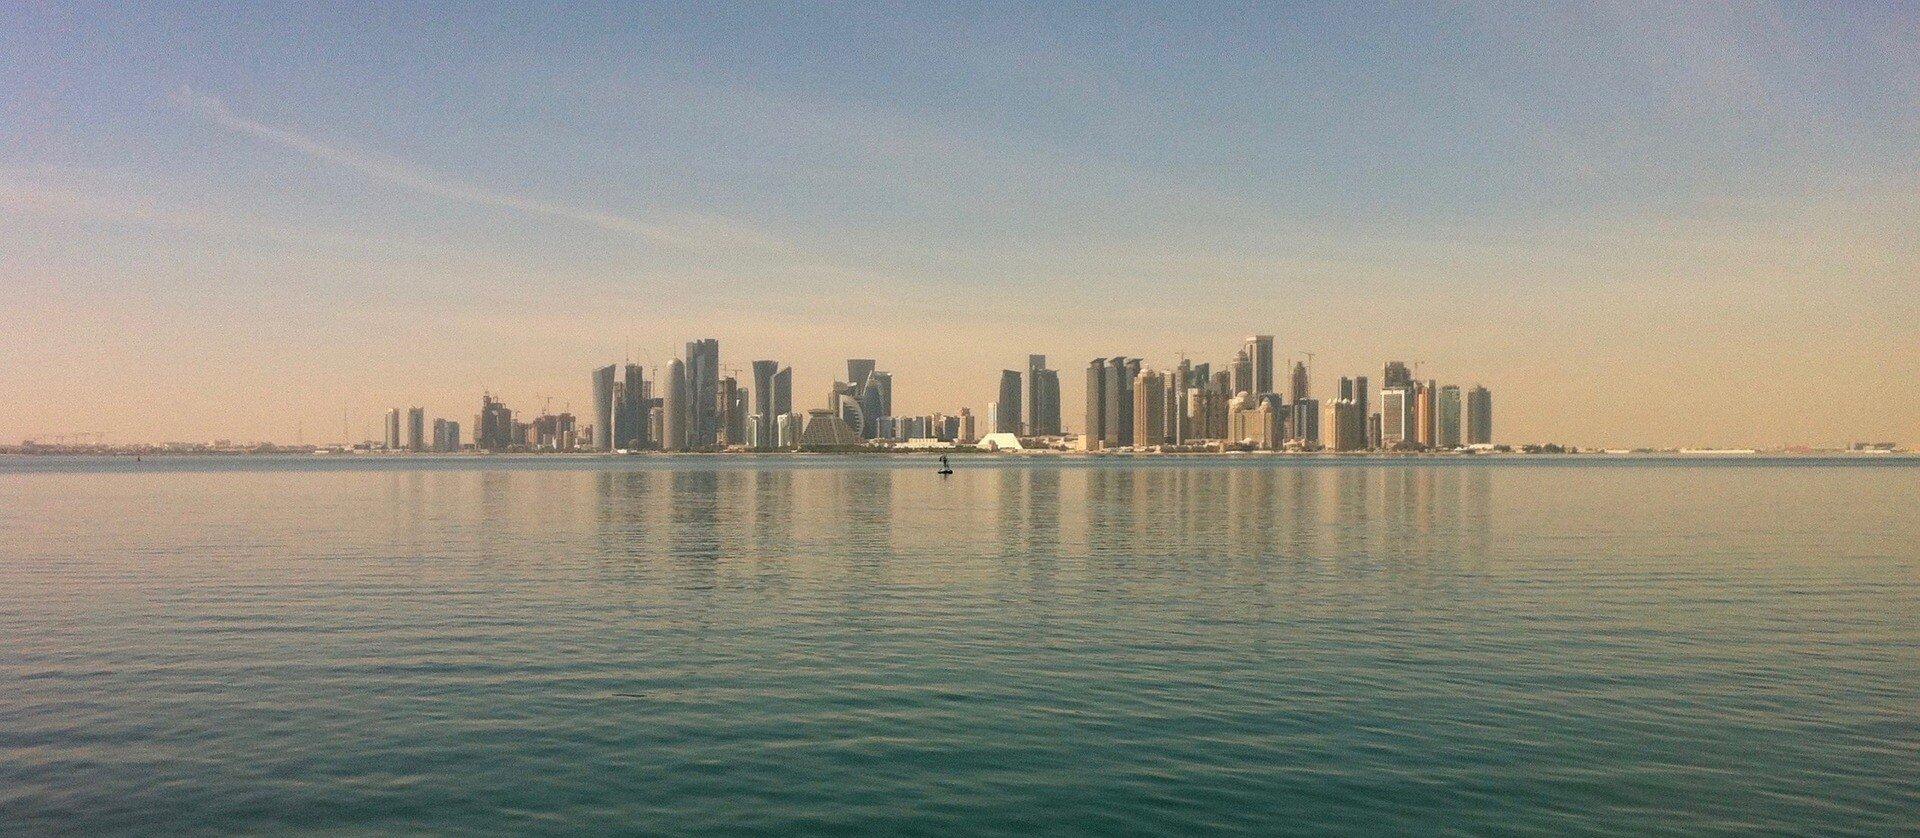 Doha landscape